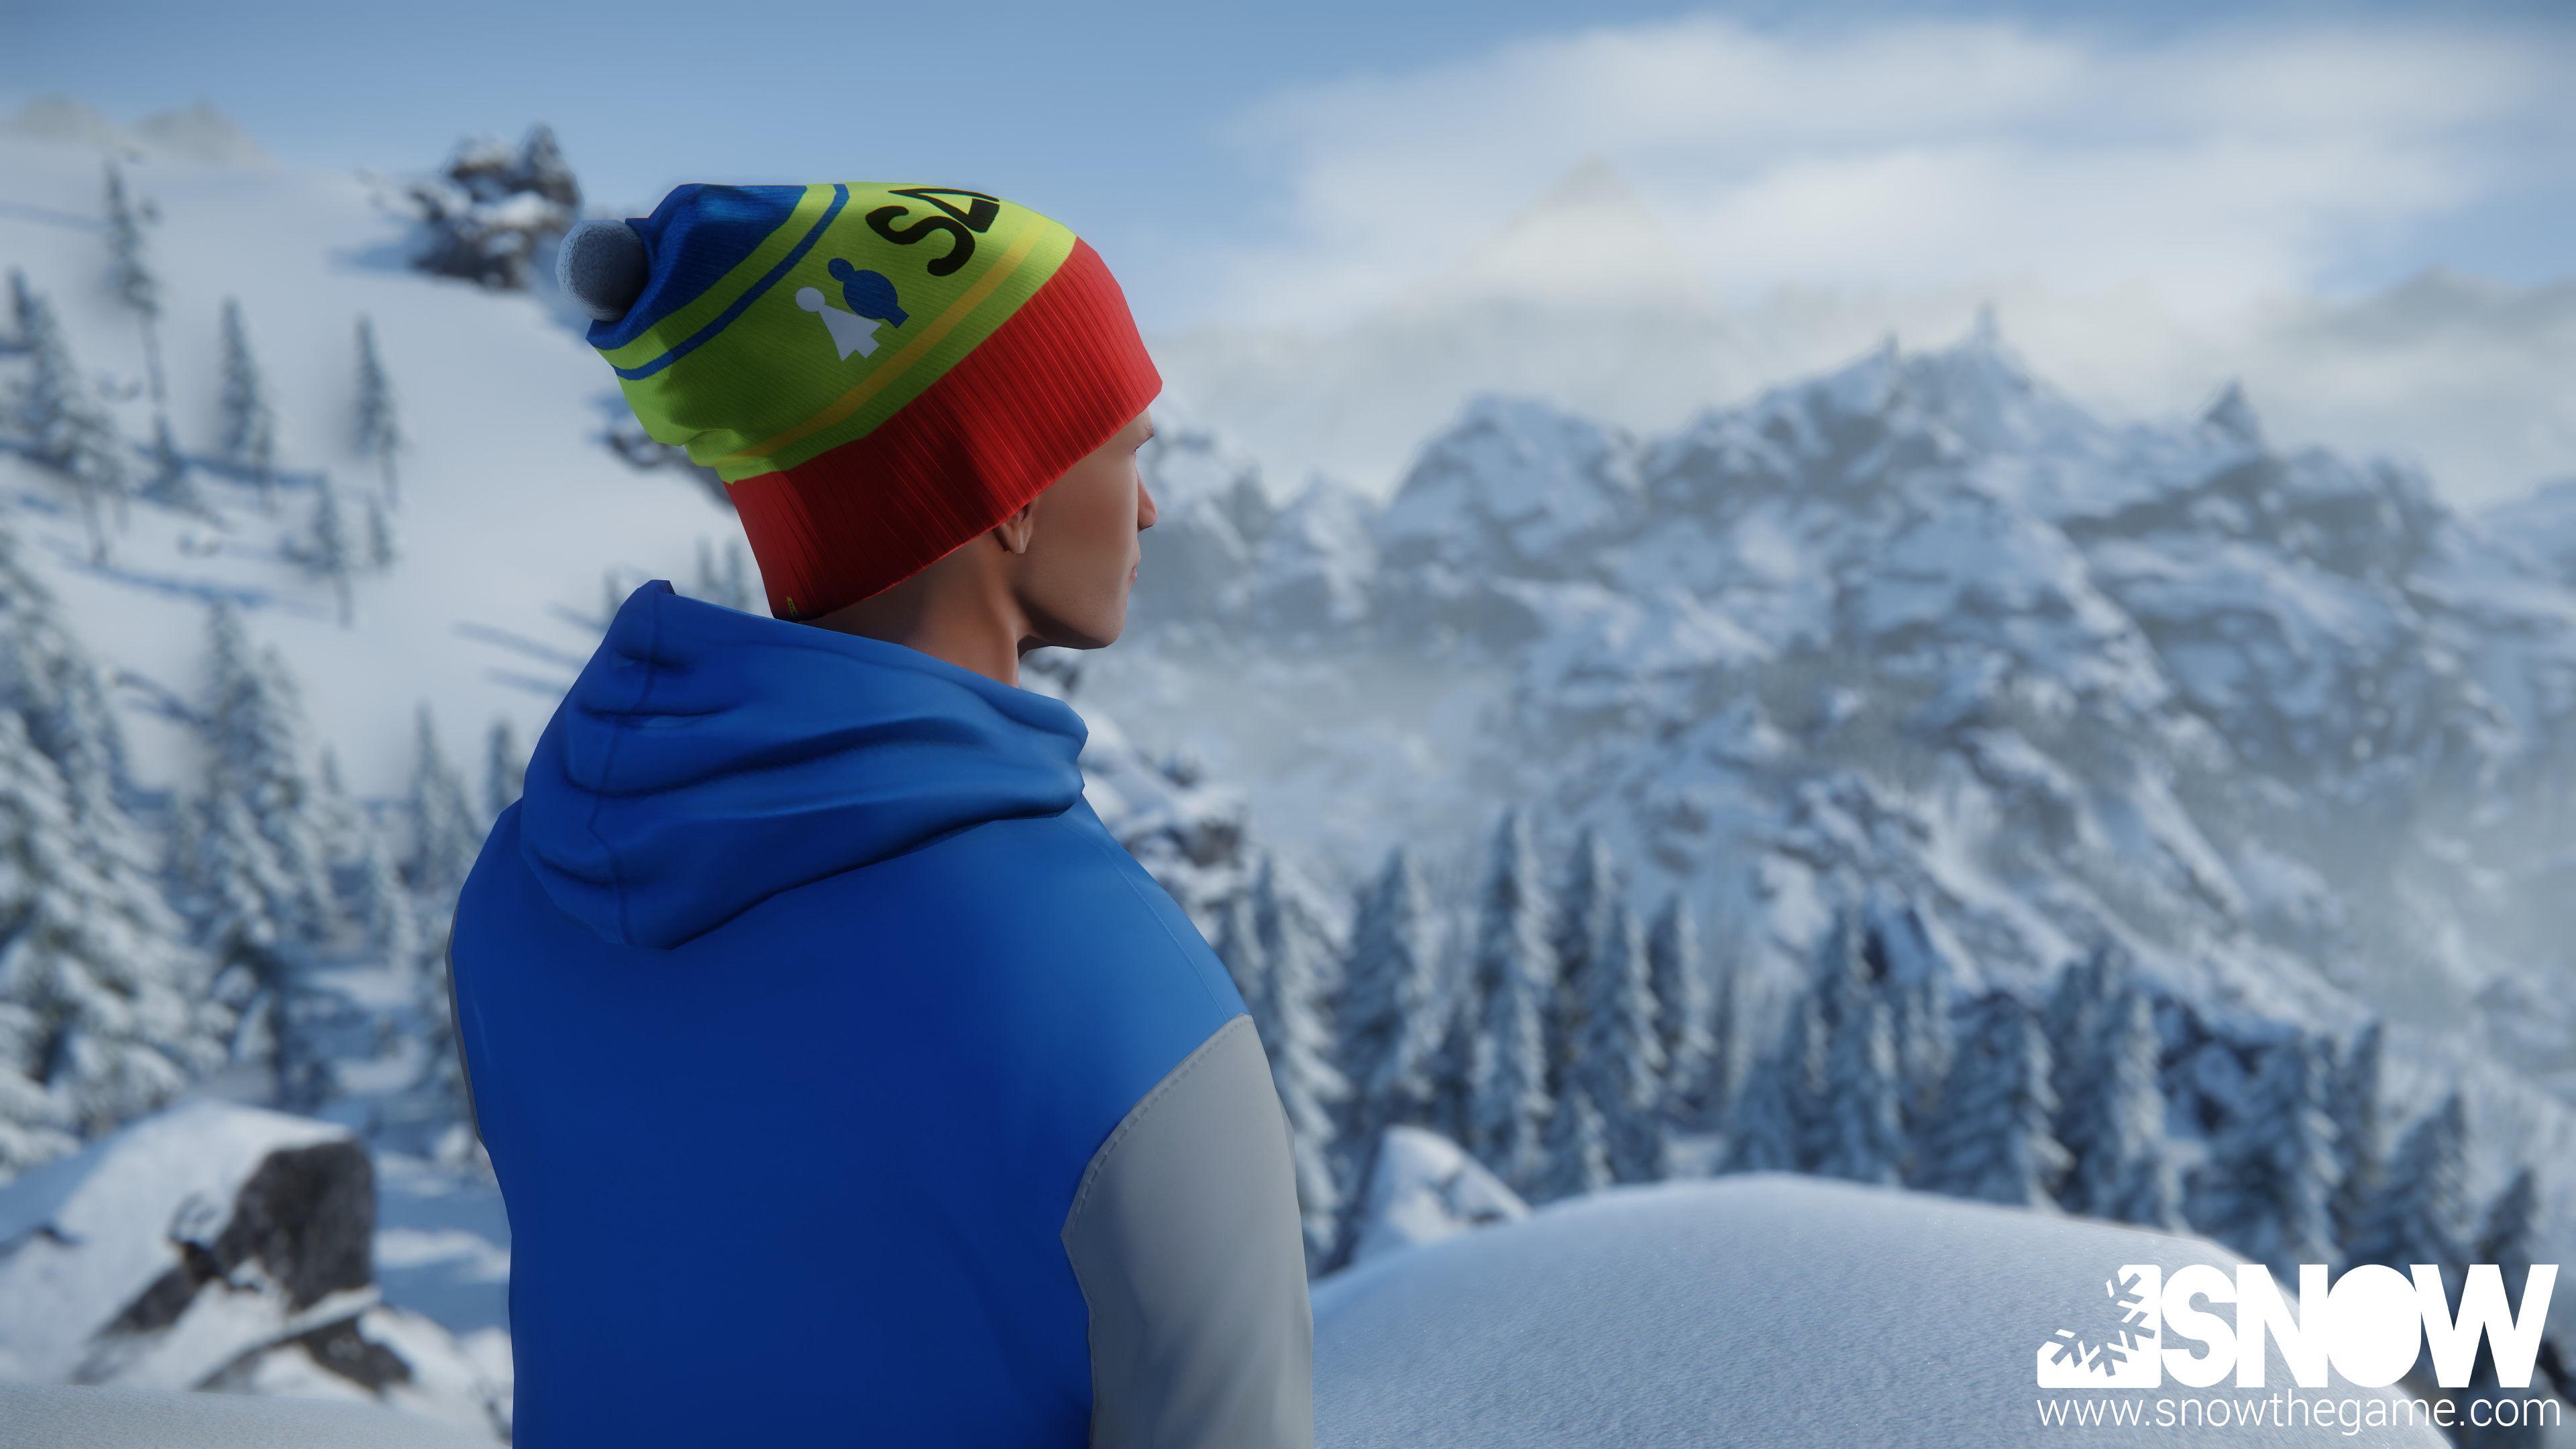 Nové obrázky z adrenalinového SNOW 88120